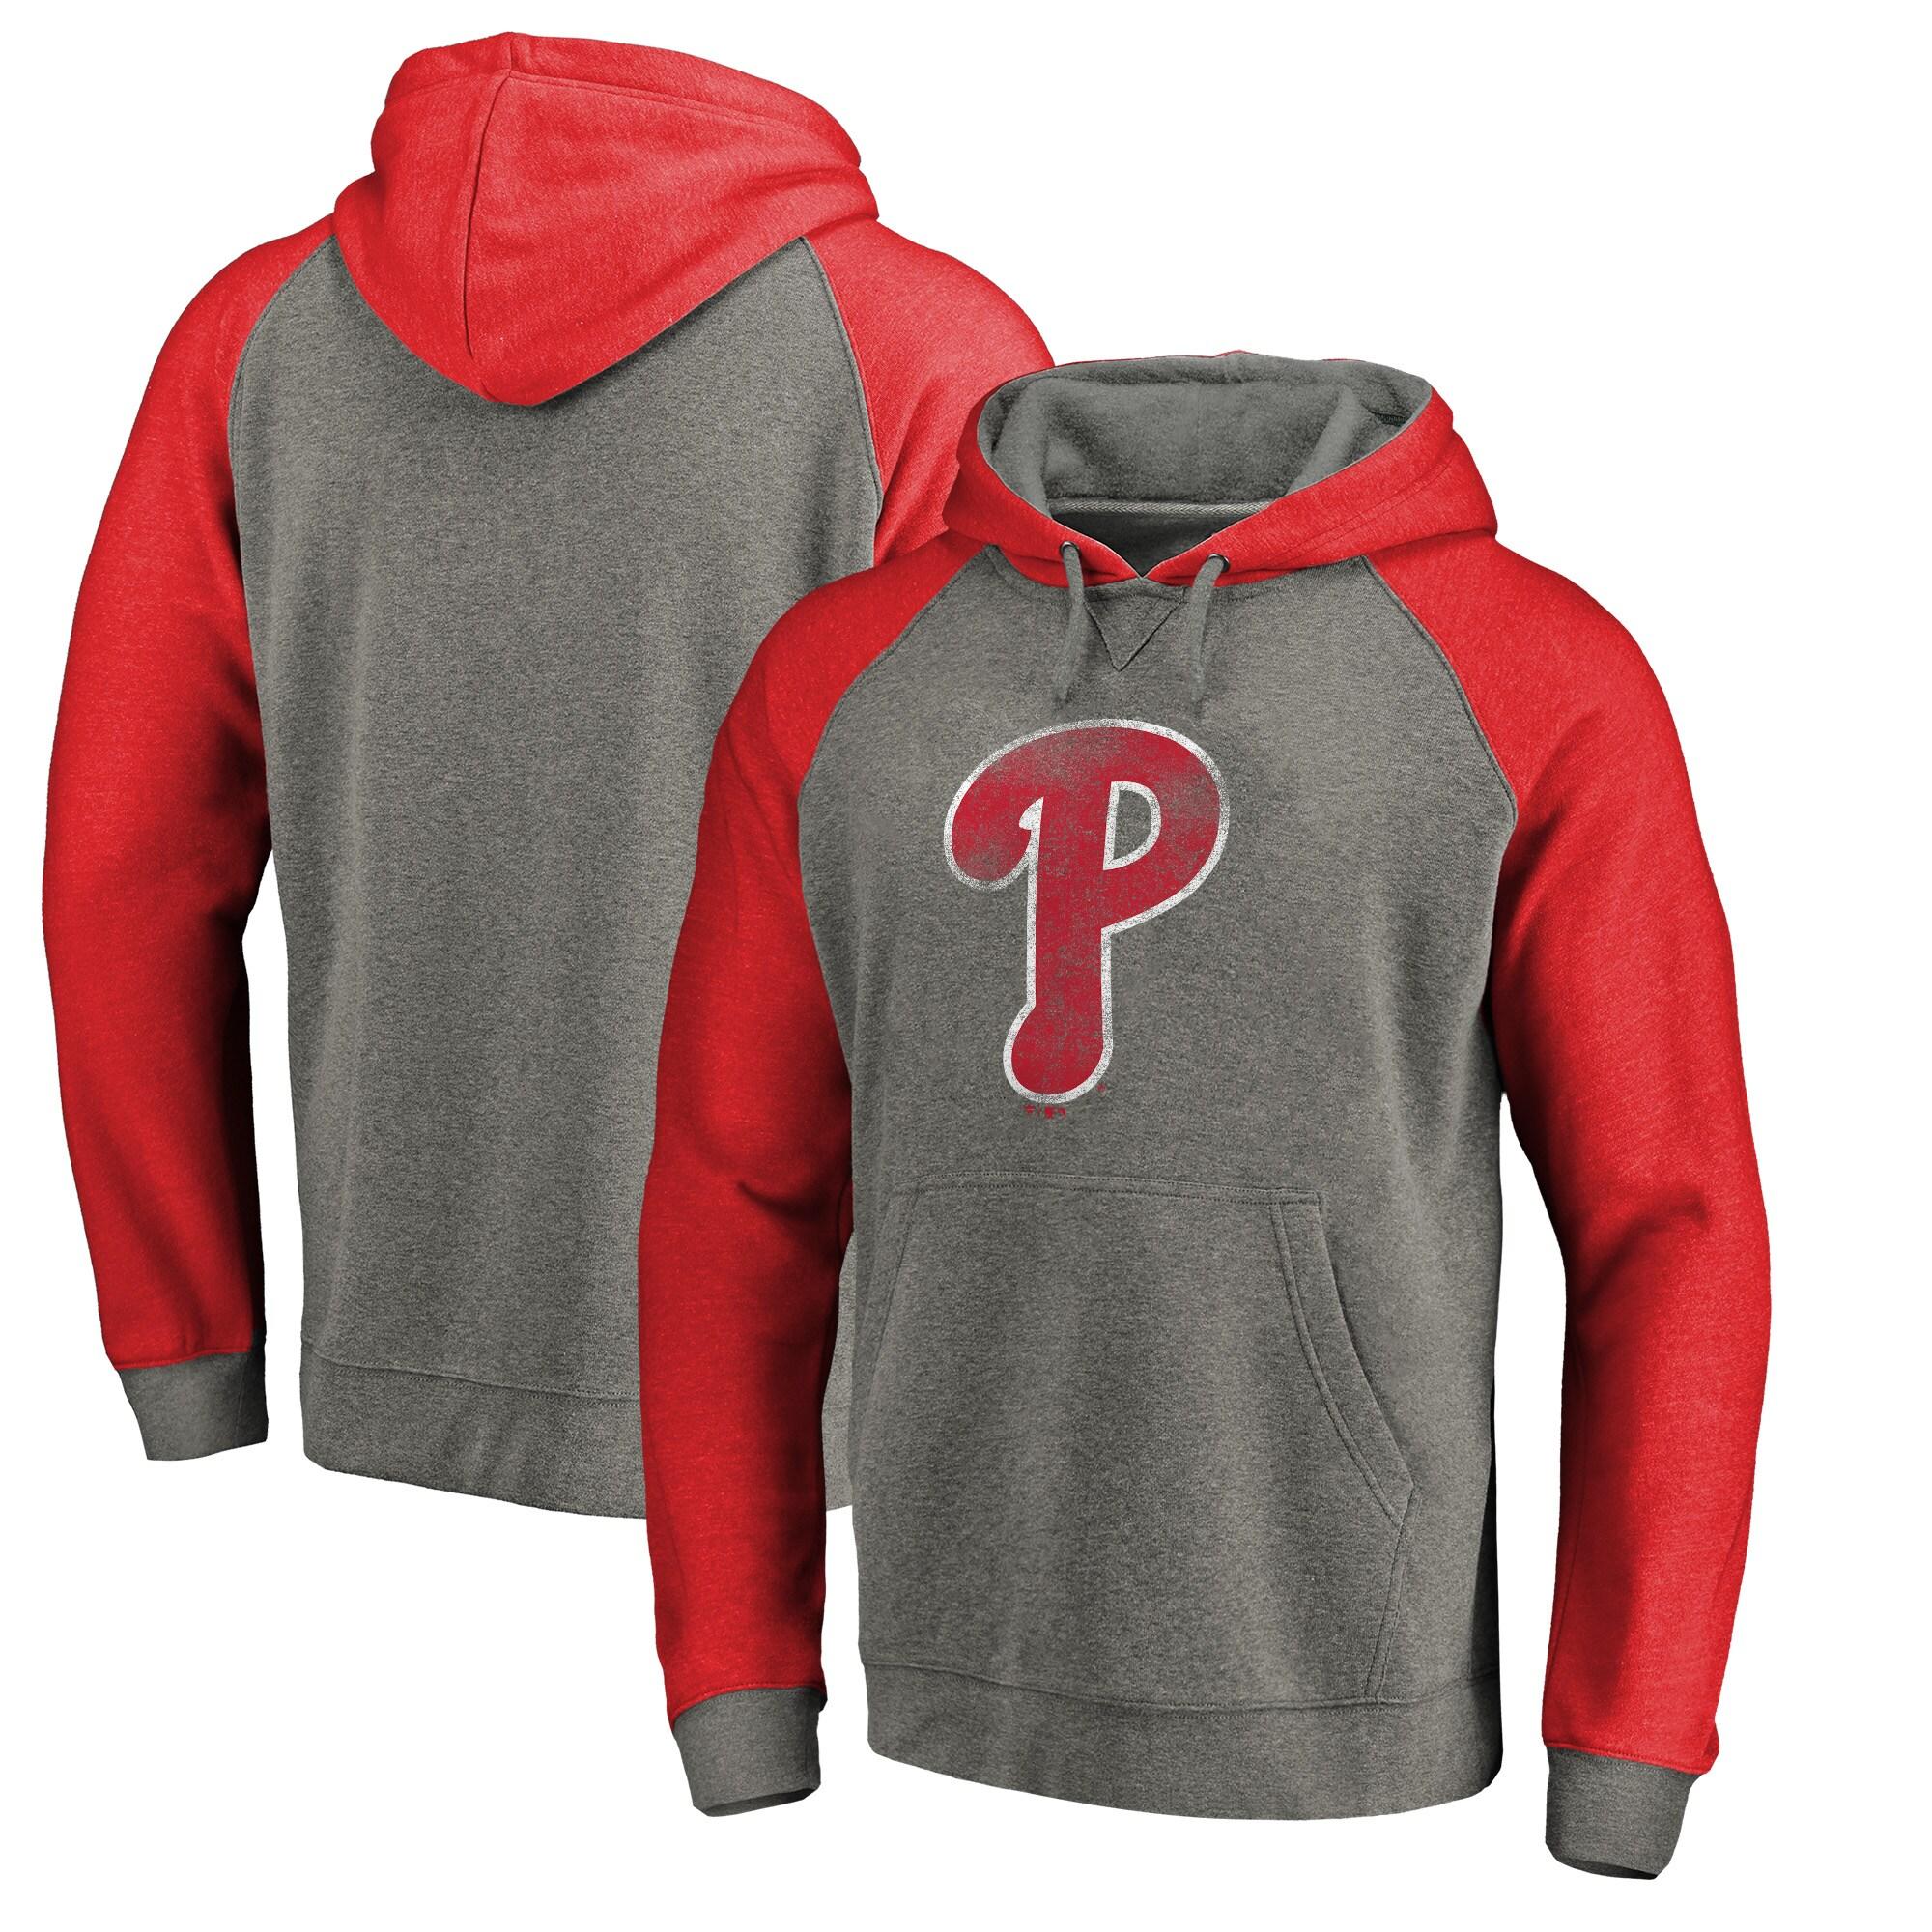 Philadelphia Phillies Fanatics Branded Distressed Team Logo Tri-Blend Raglan Pullover Hoodie - Gray/Red